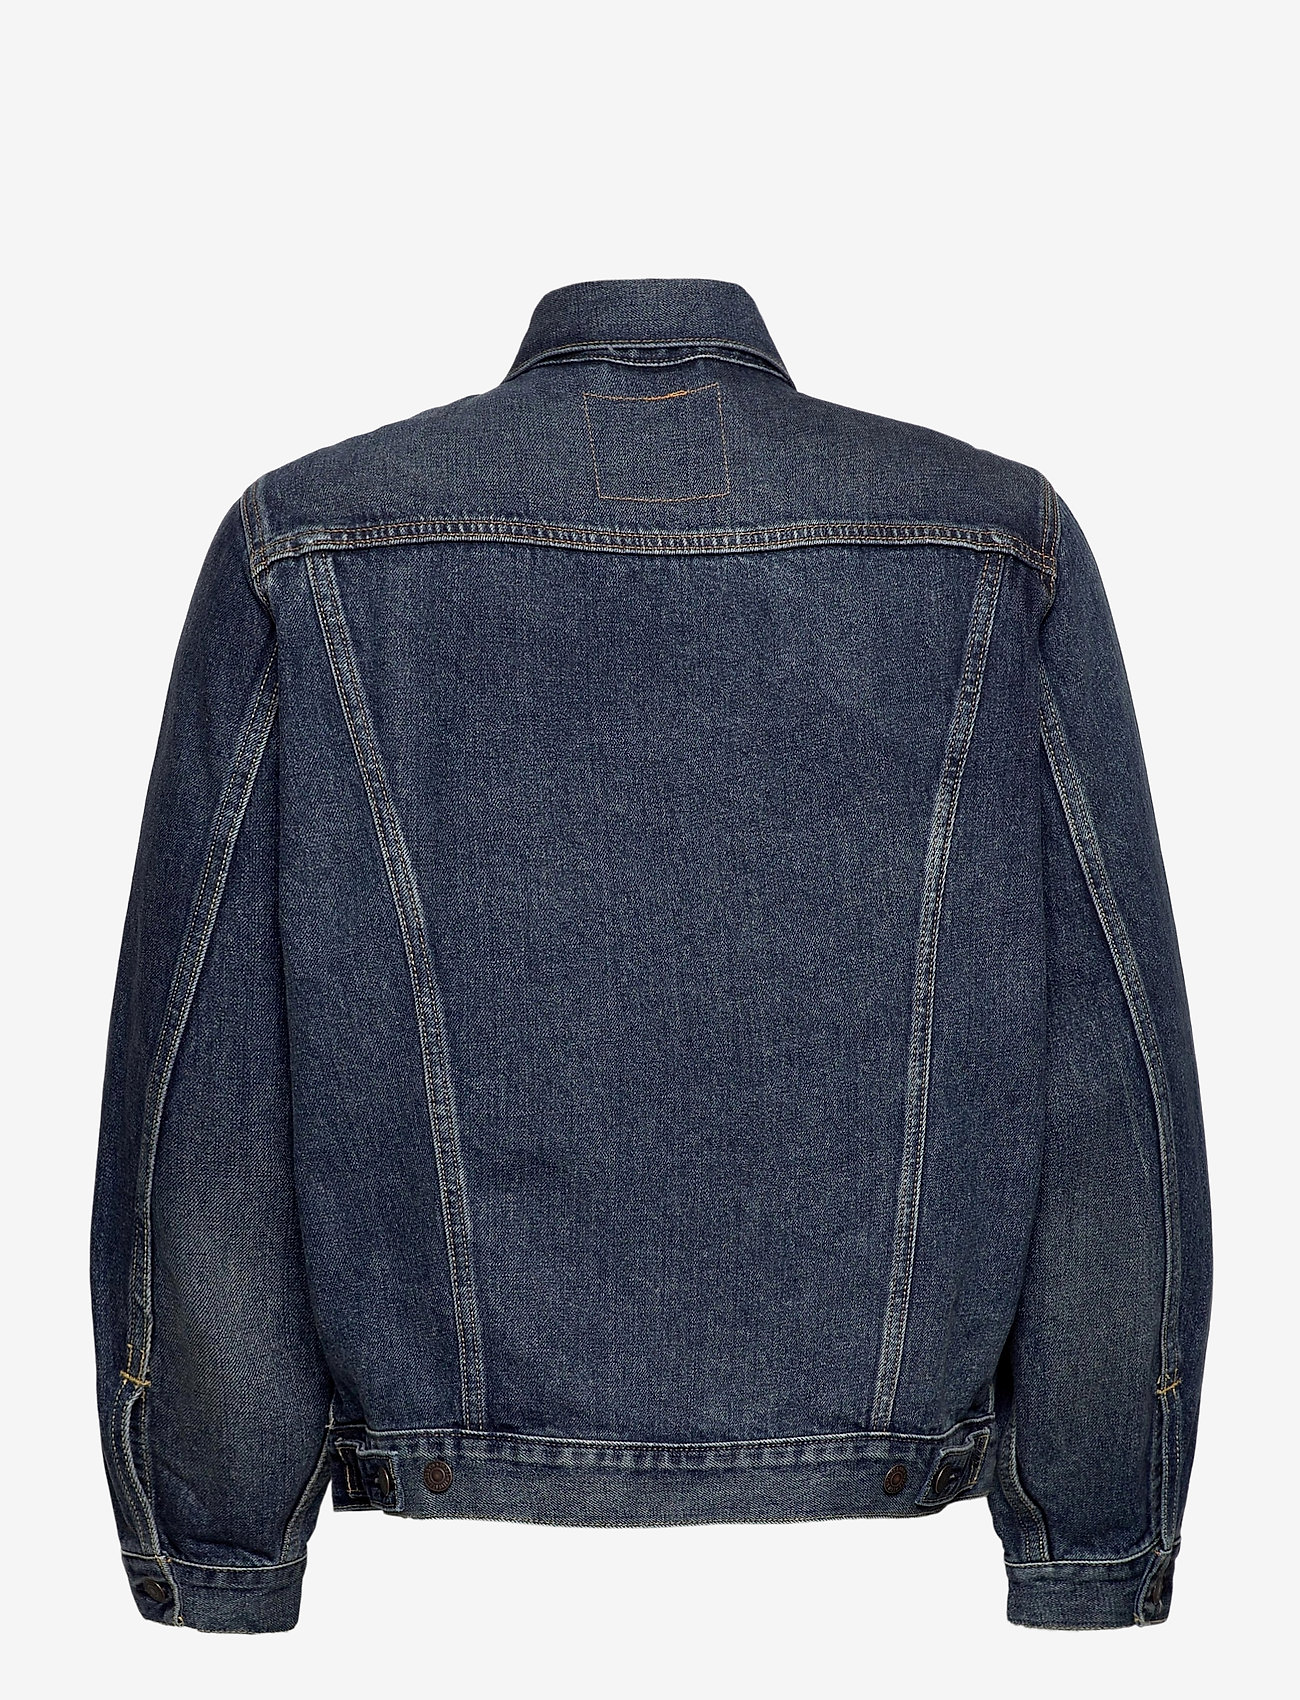 LEVI´S Men - VINTAGE FIT TRUCKER V. ROAMER - denim jackets - dark indigo - worn in - 1